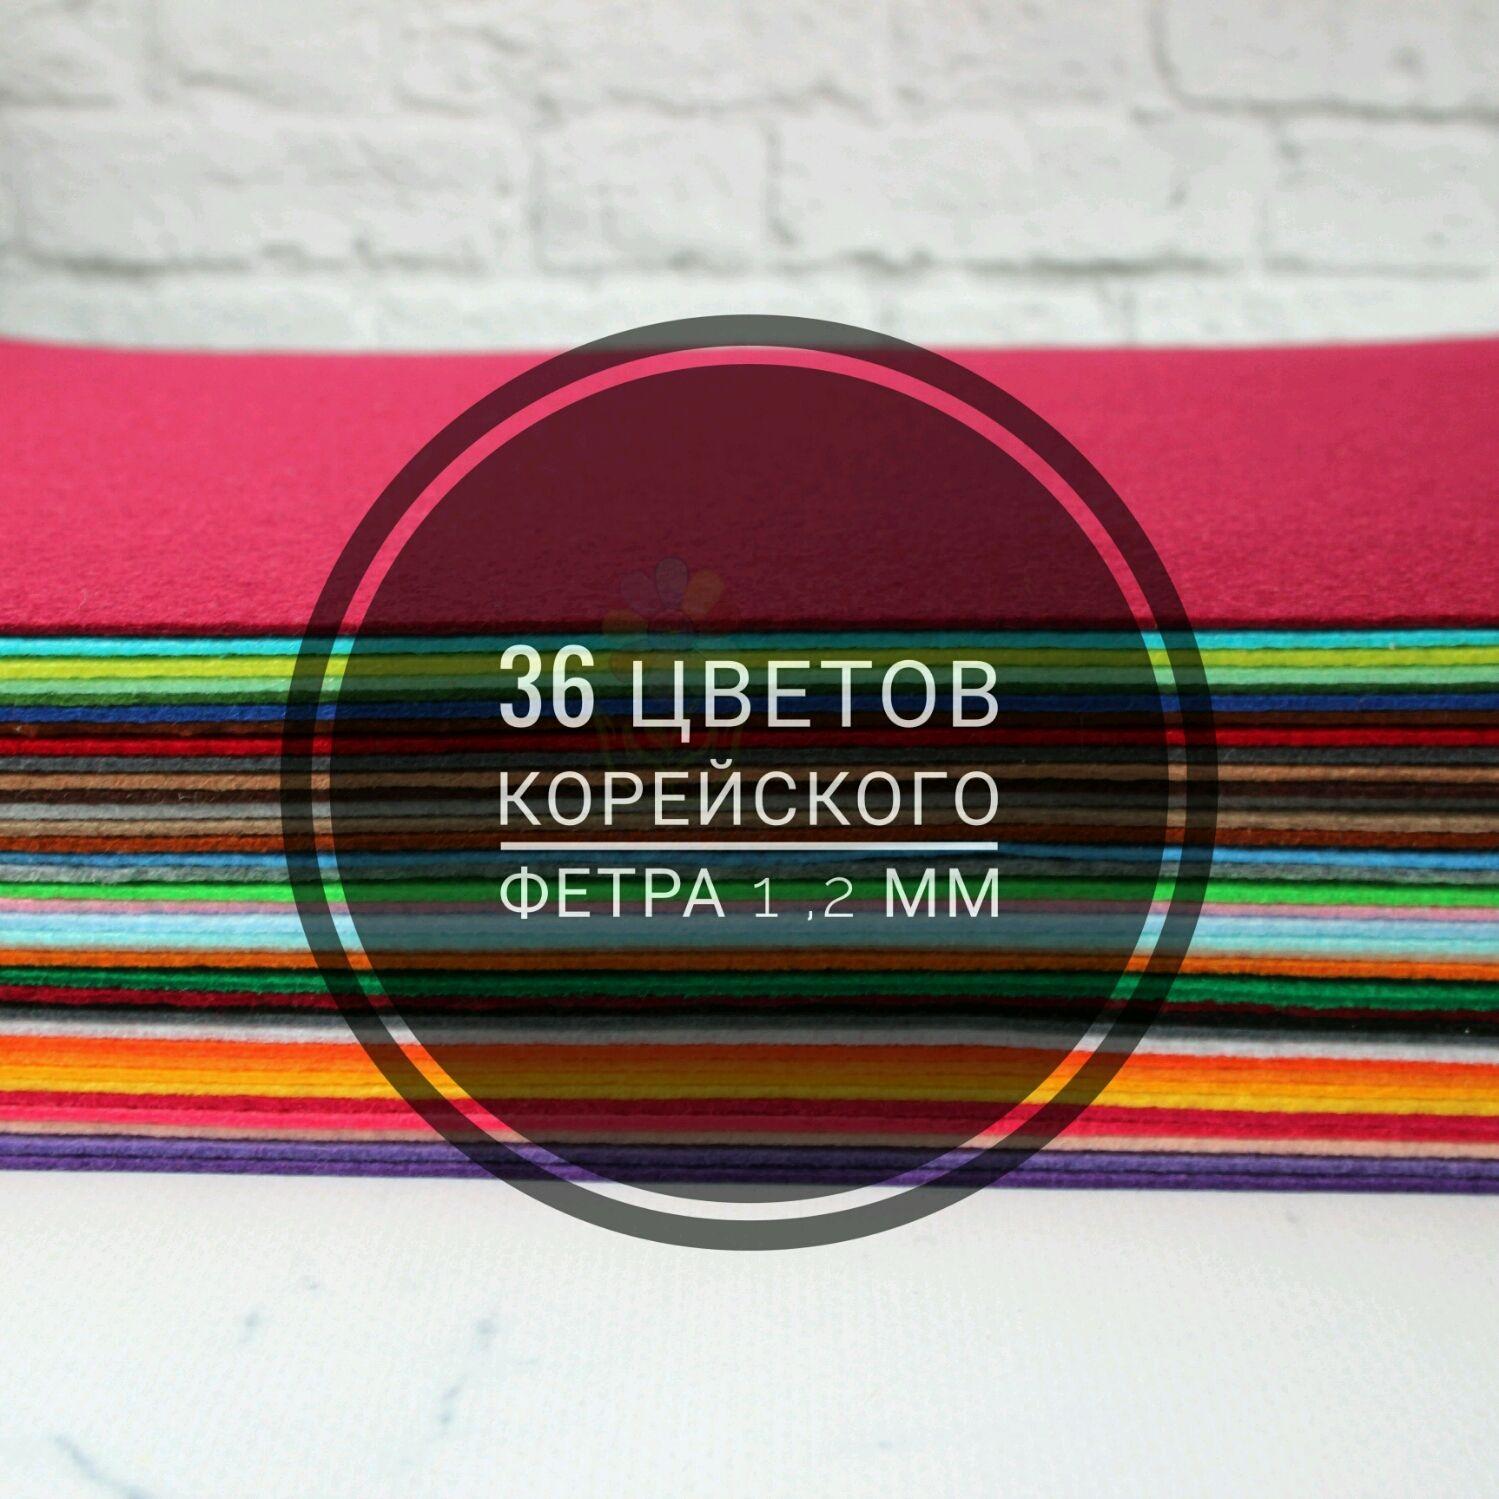 Набор жеского корейского фетра 1,2 мм  36 цветов, Фетр, Санкт-Петербург,  Фото №1